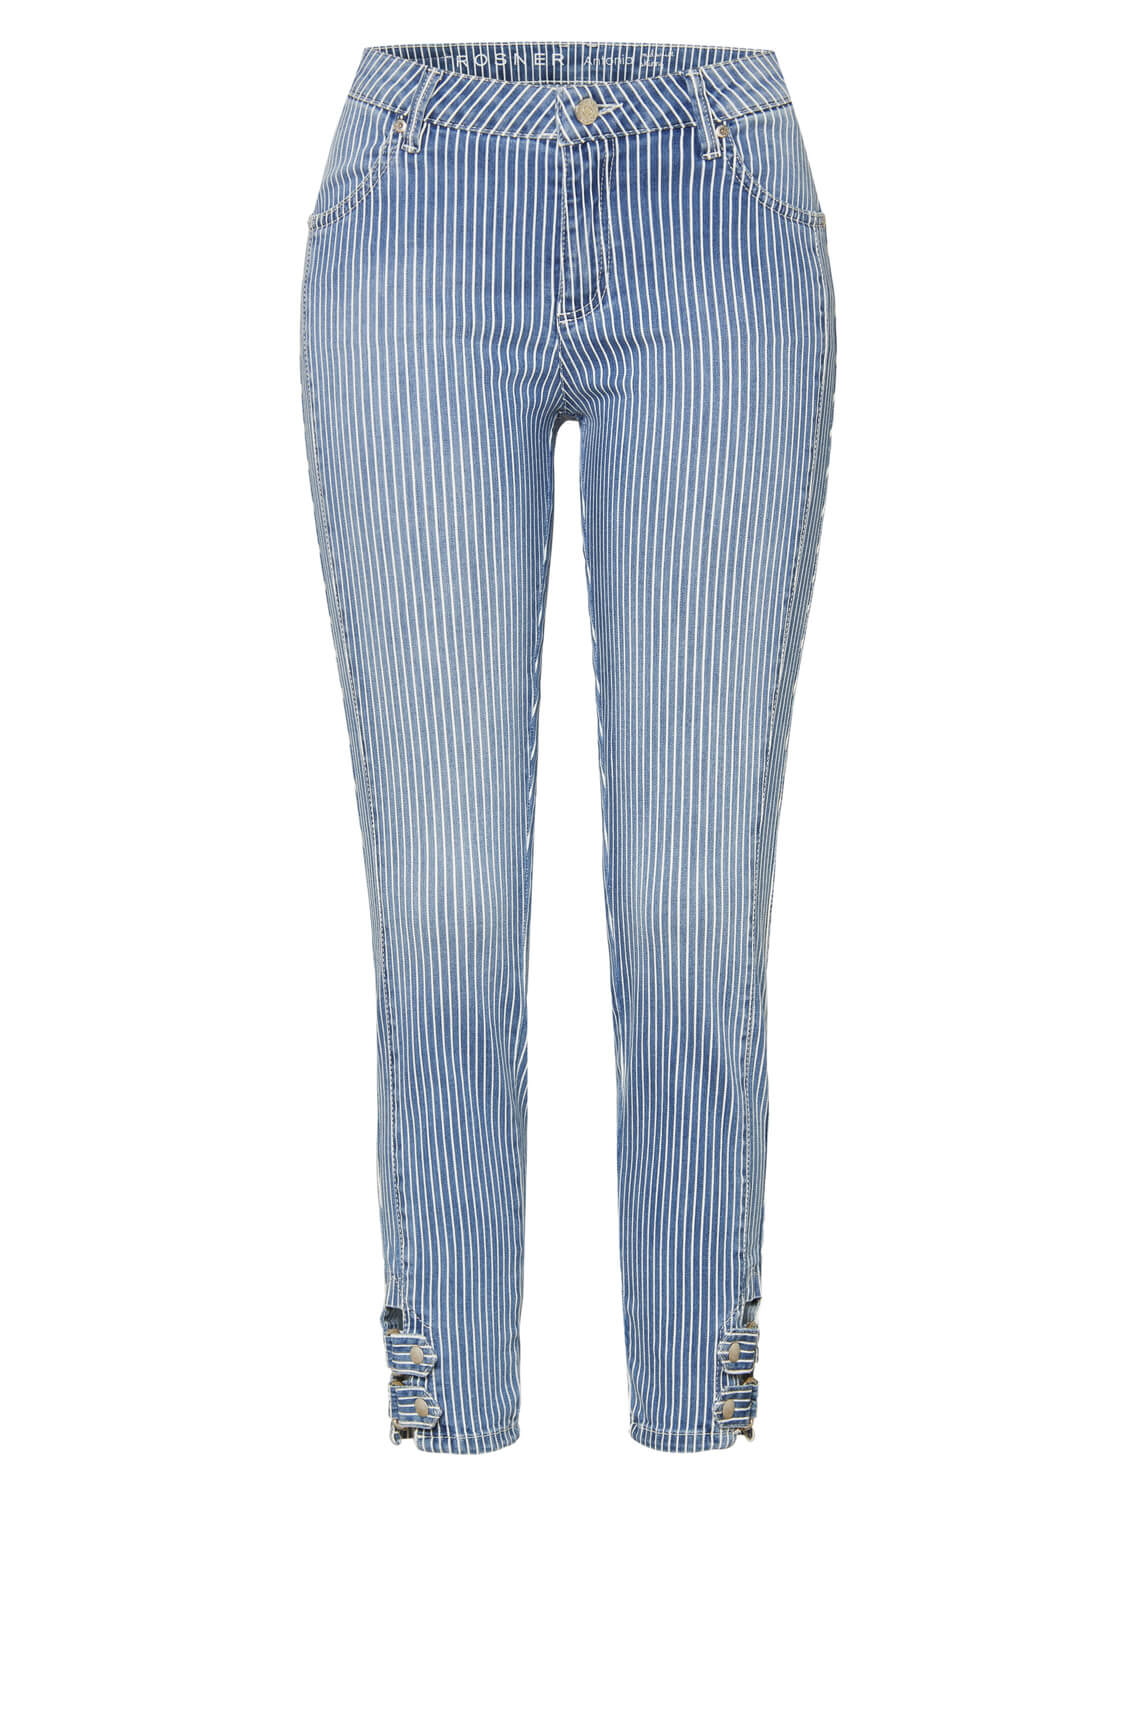 Rosner Dames L28 Antonia gestreepte jeans Blauw